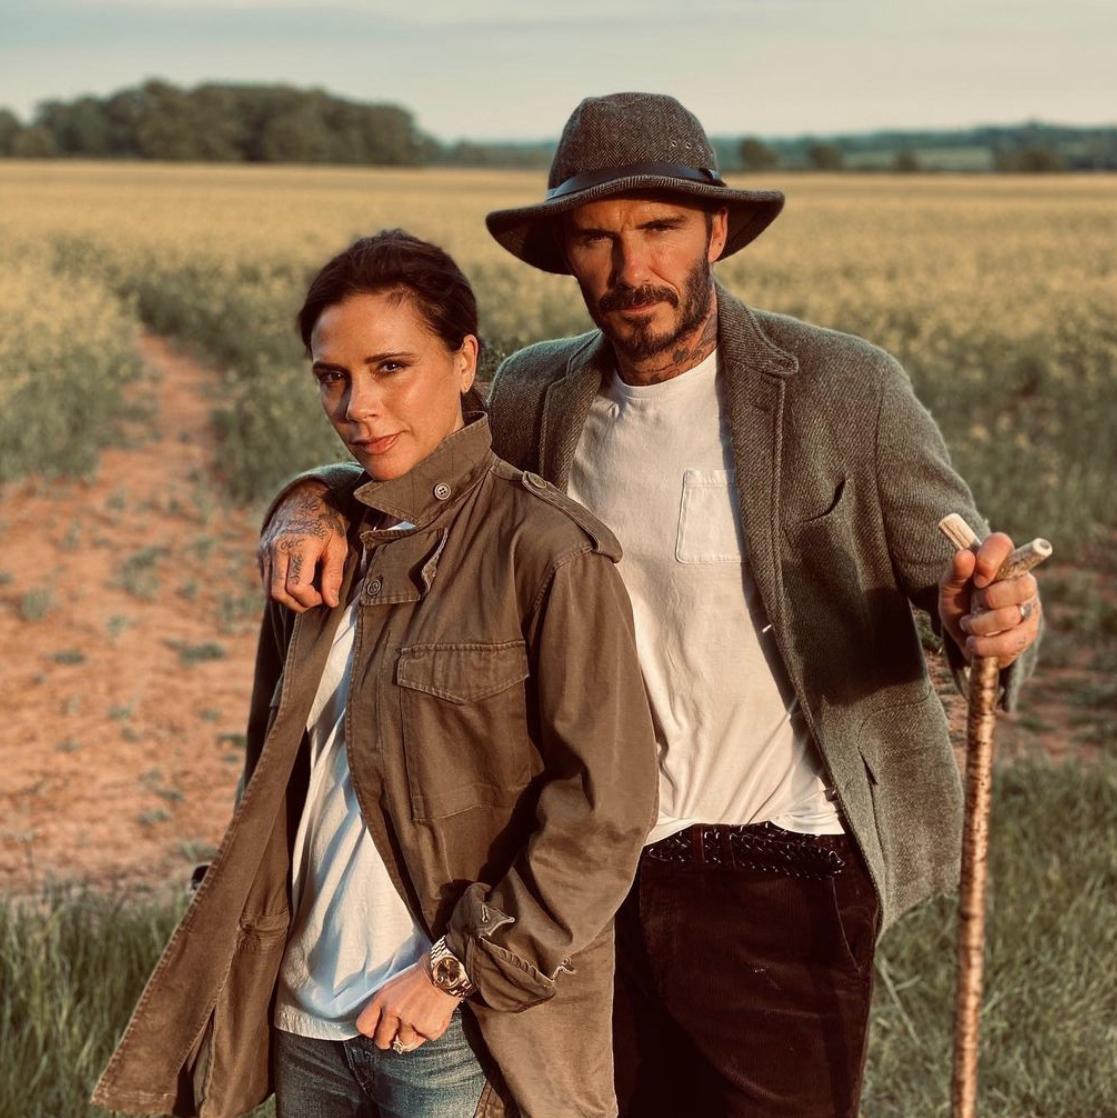 David and Victoria Beckham Insta